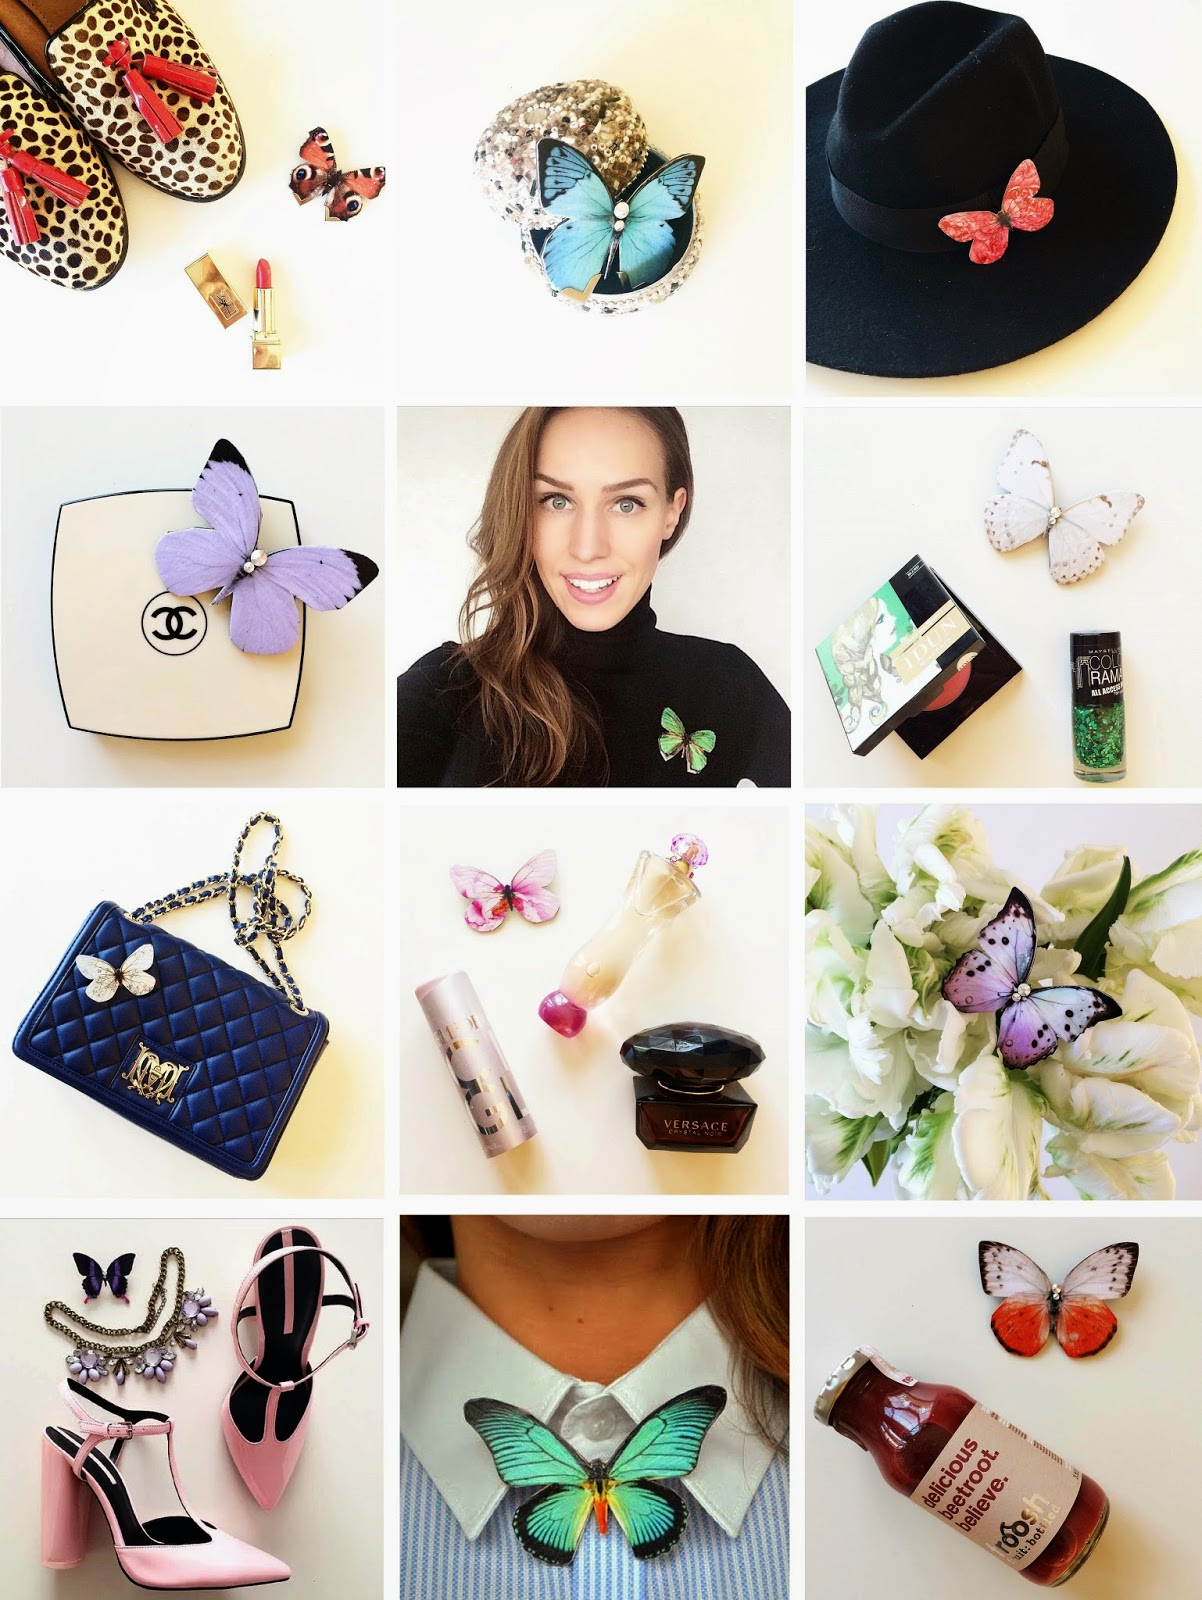 kristjaana mere instagram flat lay kuma butterfly brooch